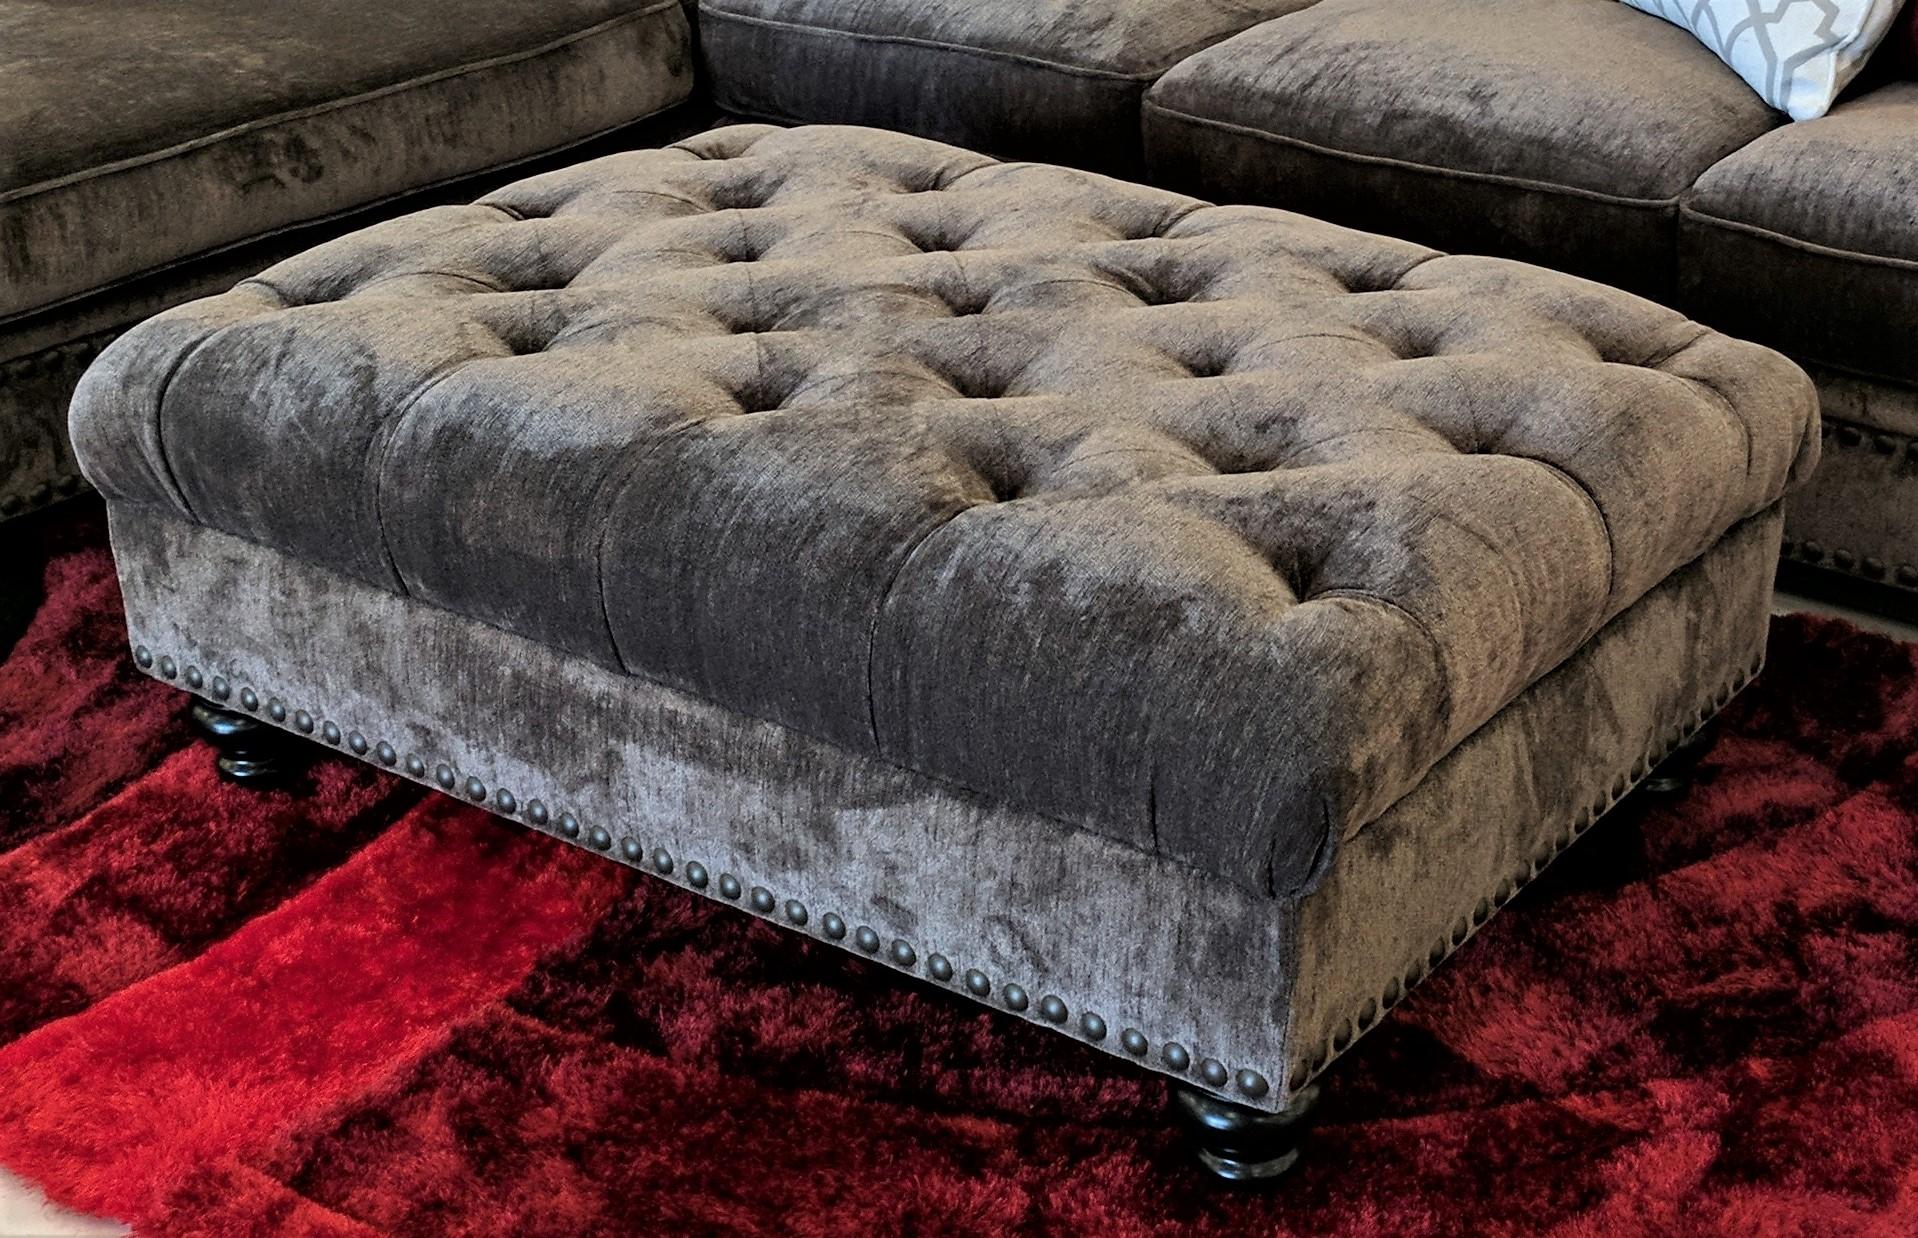 Pleasing Furniture Couches Sectionals Sofas John Michael Designs Llc Beatyapartments Chair Design Images Beatyapartmentscom